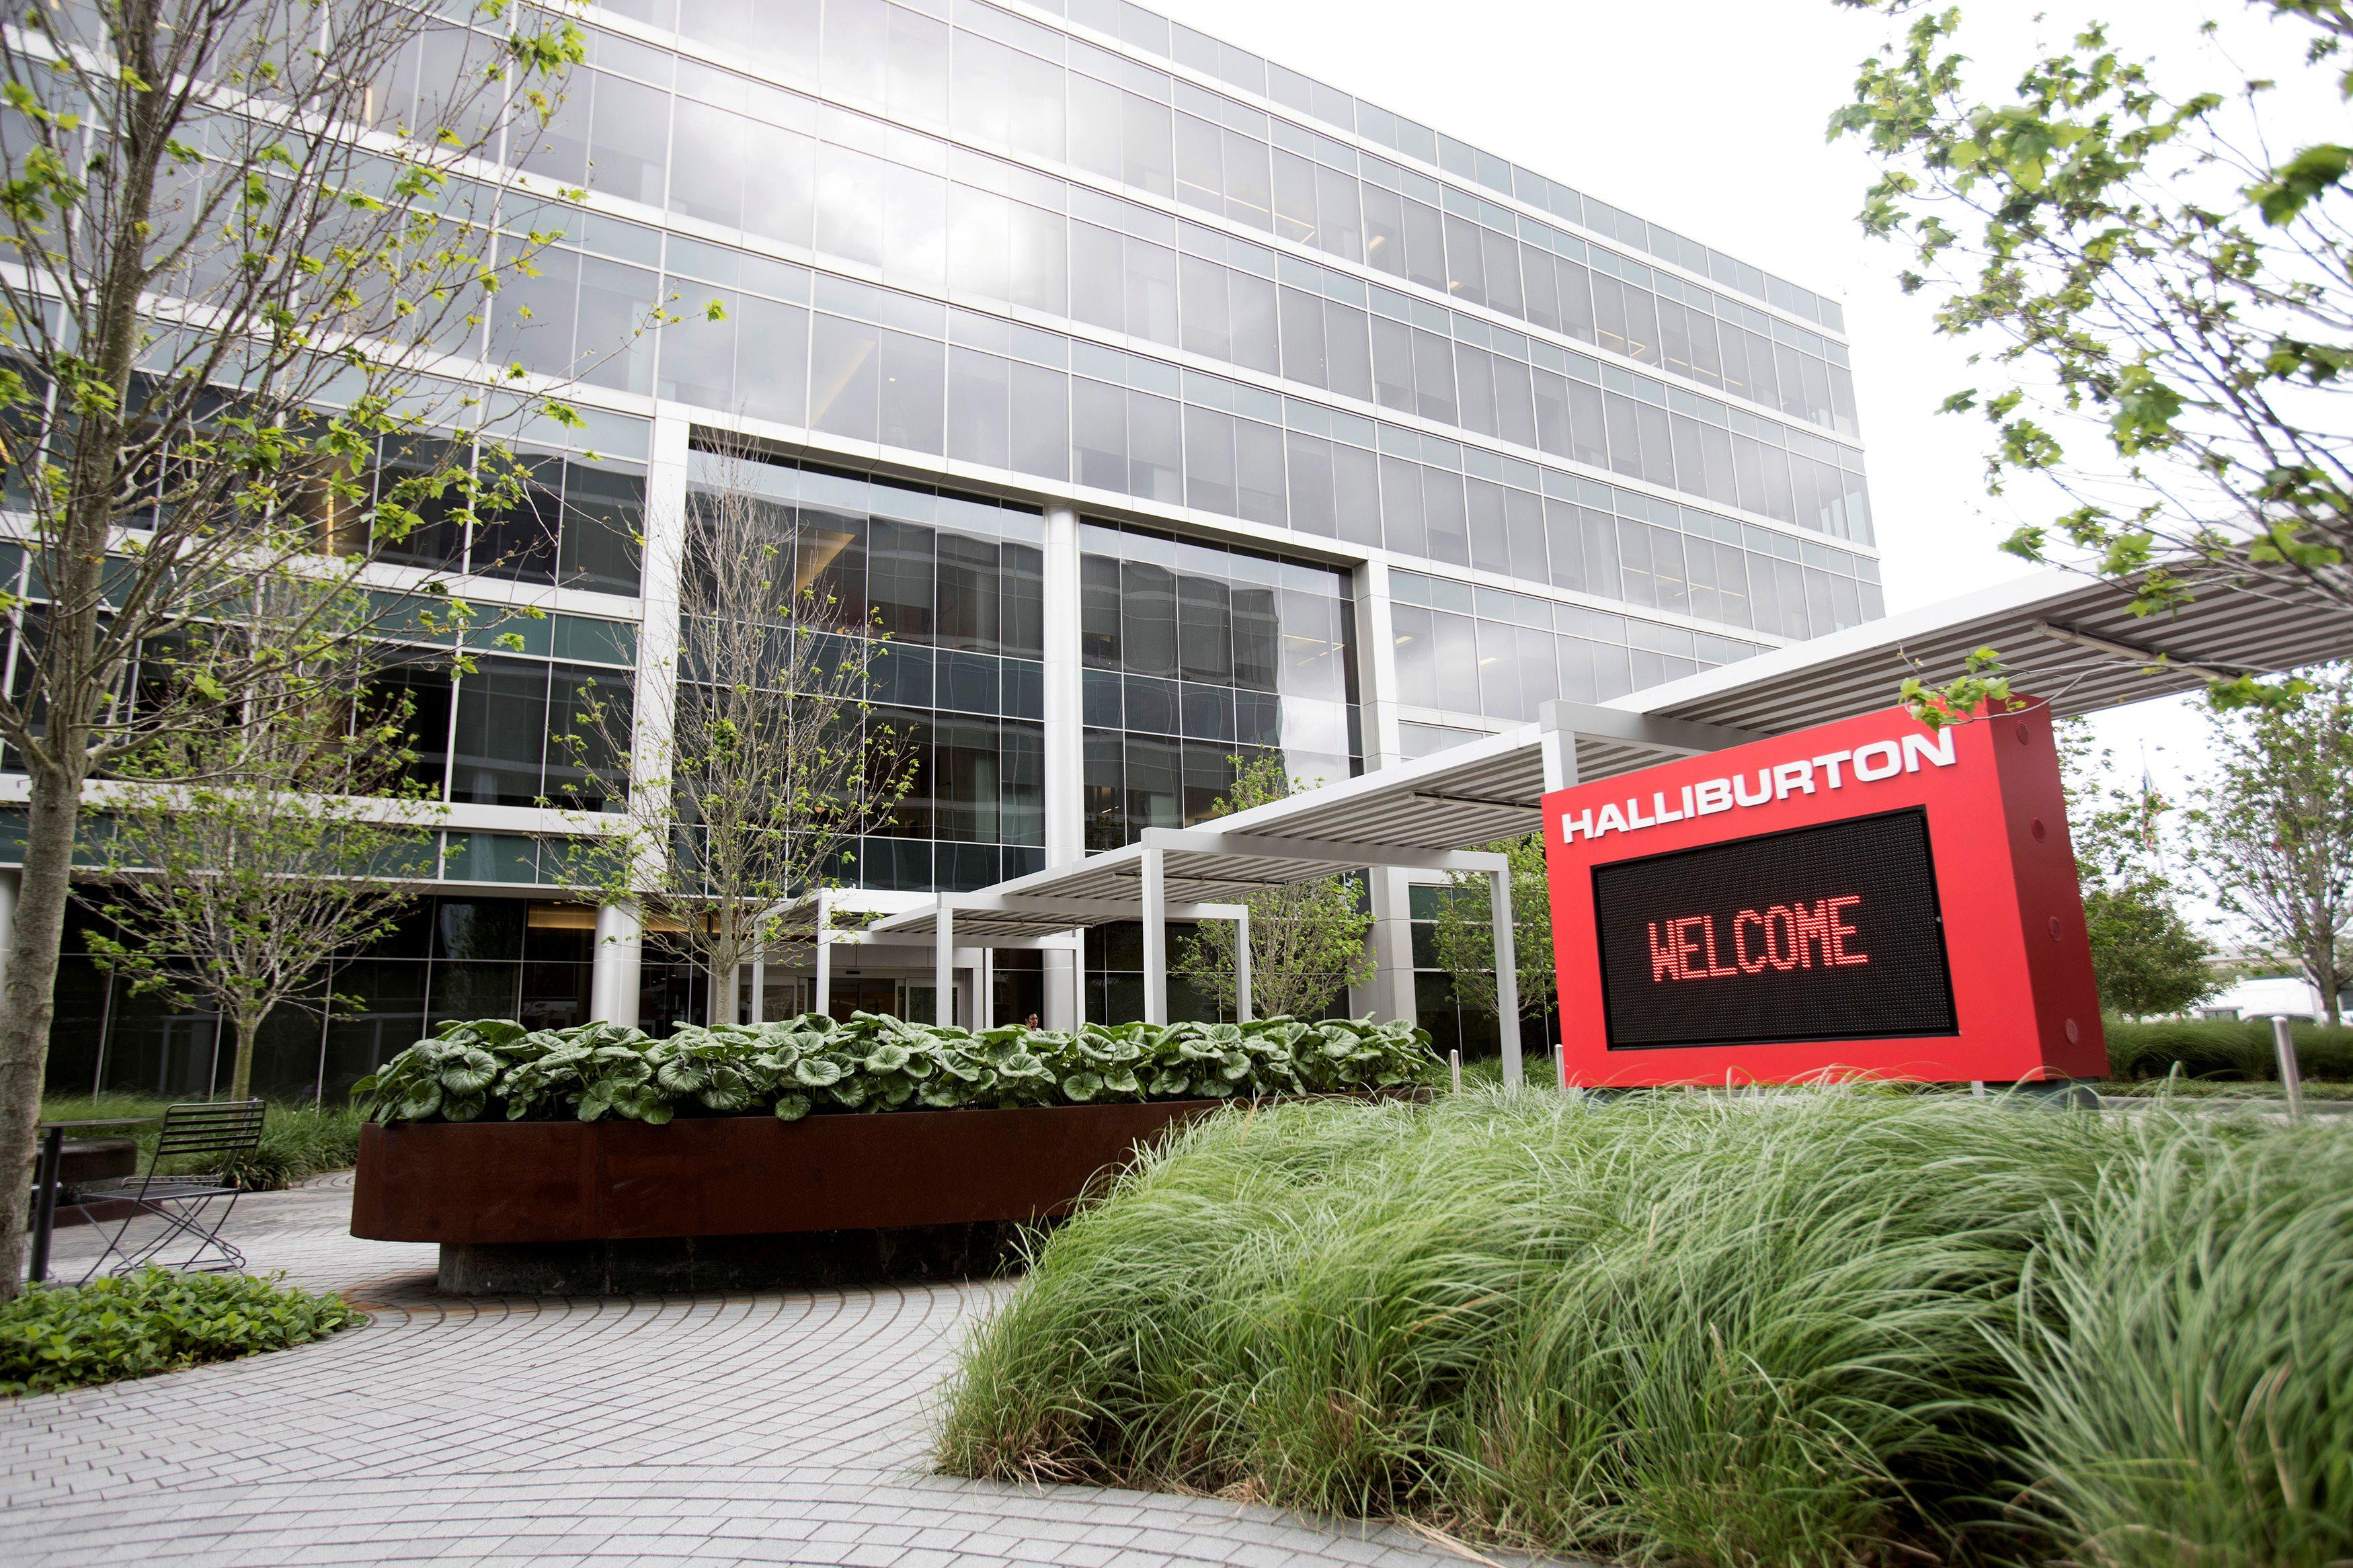 Halliburton's campus in Houston, Texas, U.S. May 18, 2017. REUTERS/Daniel Kramer